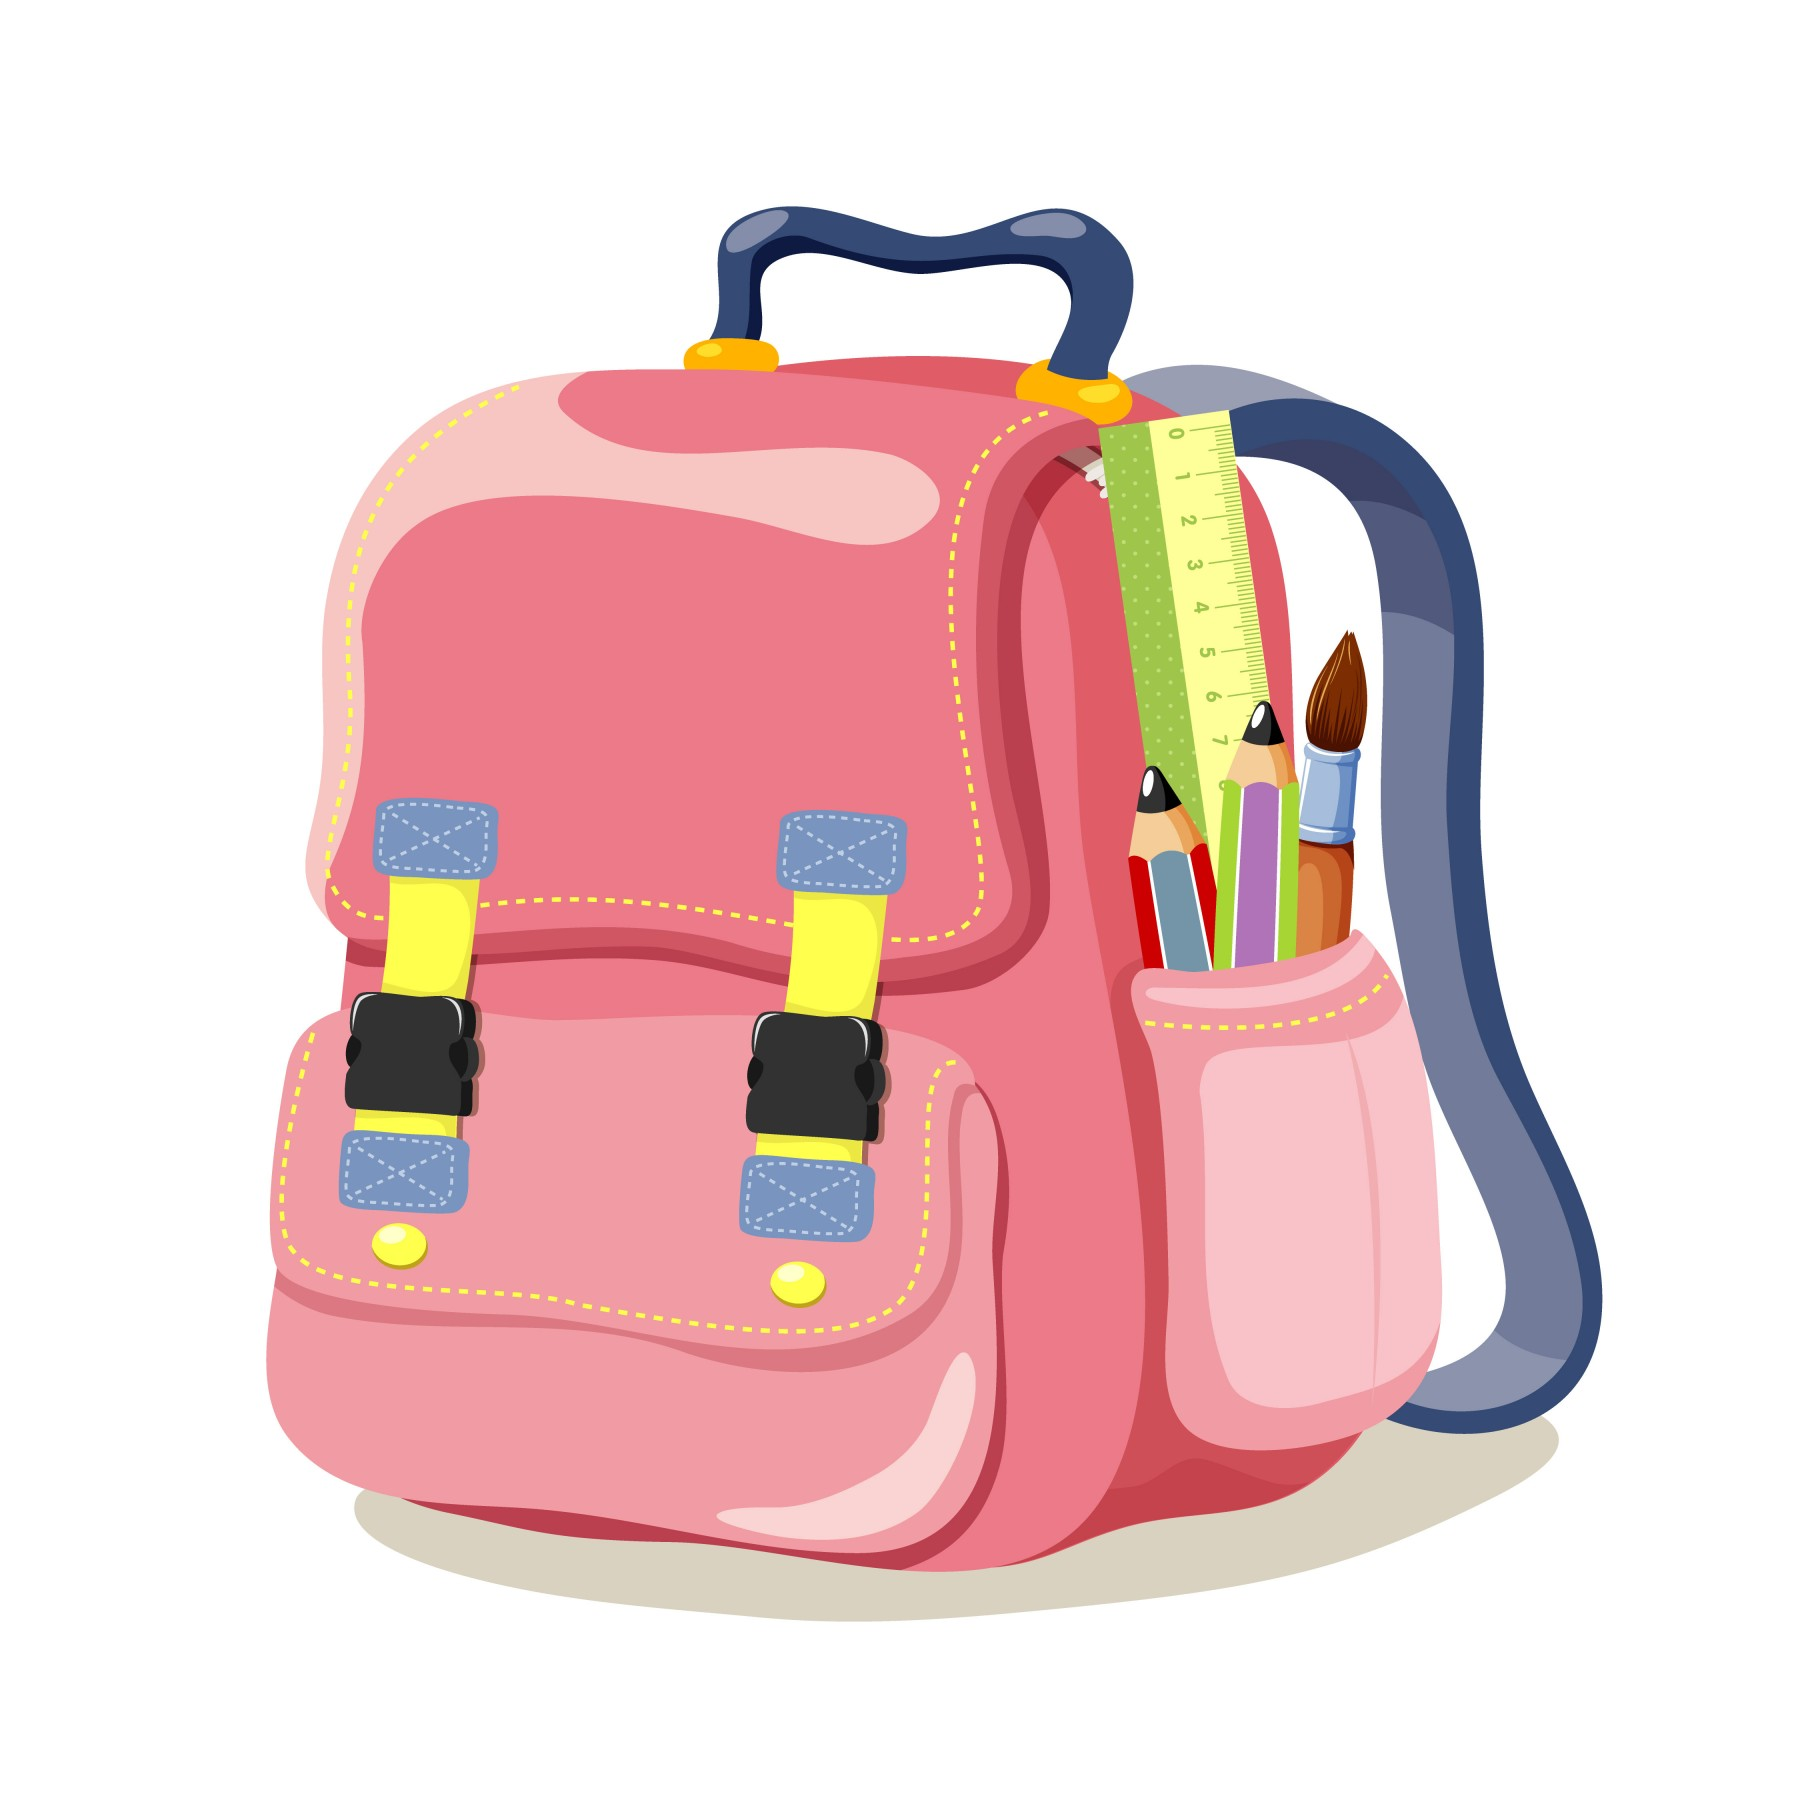 Bag clipart cartoon.  school bags library